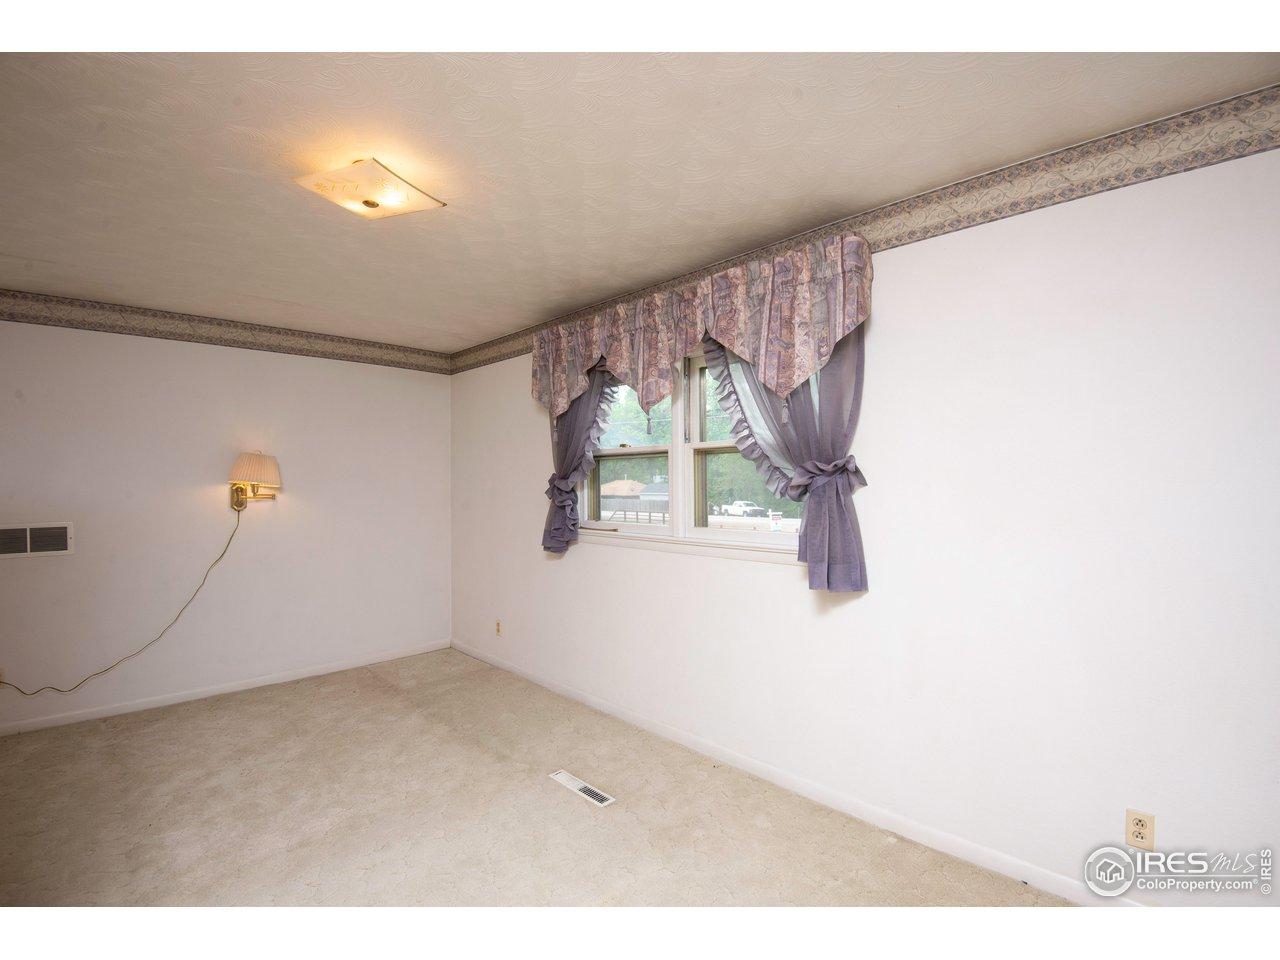 2nd bedroom upper level